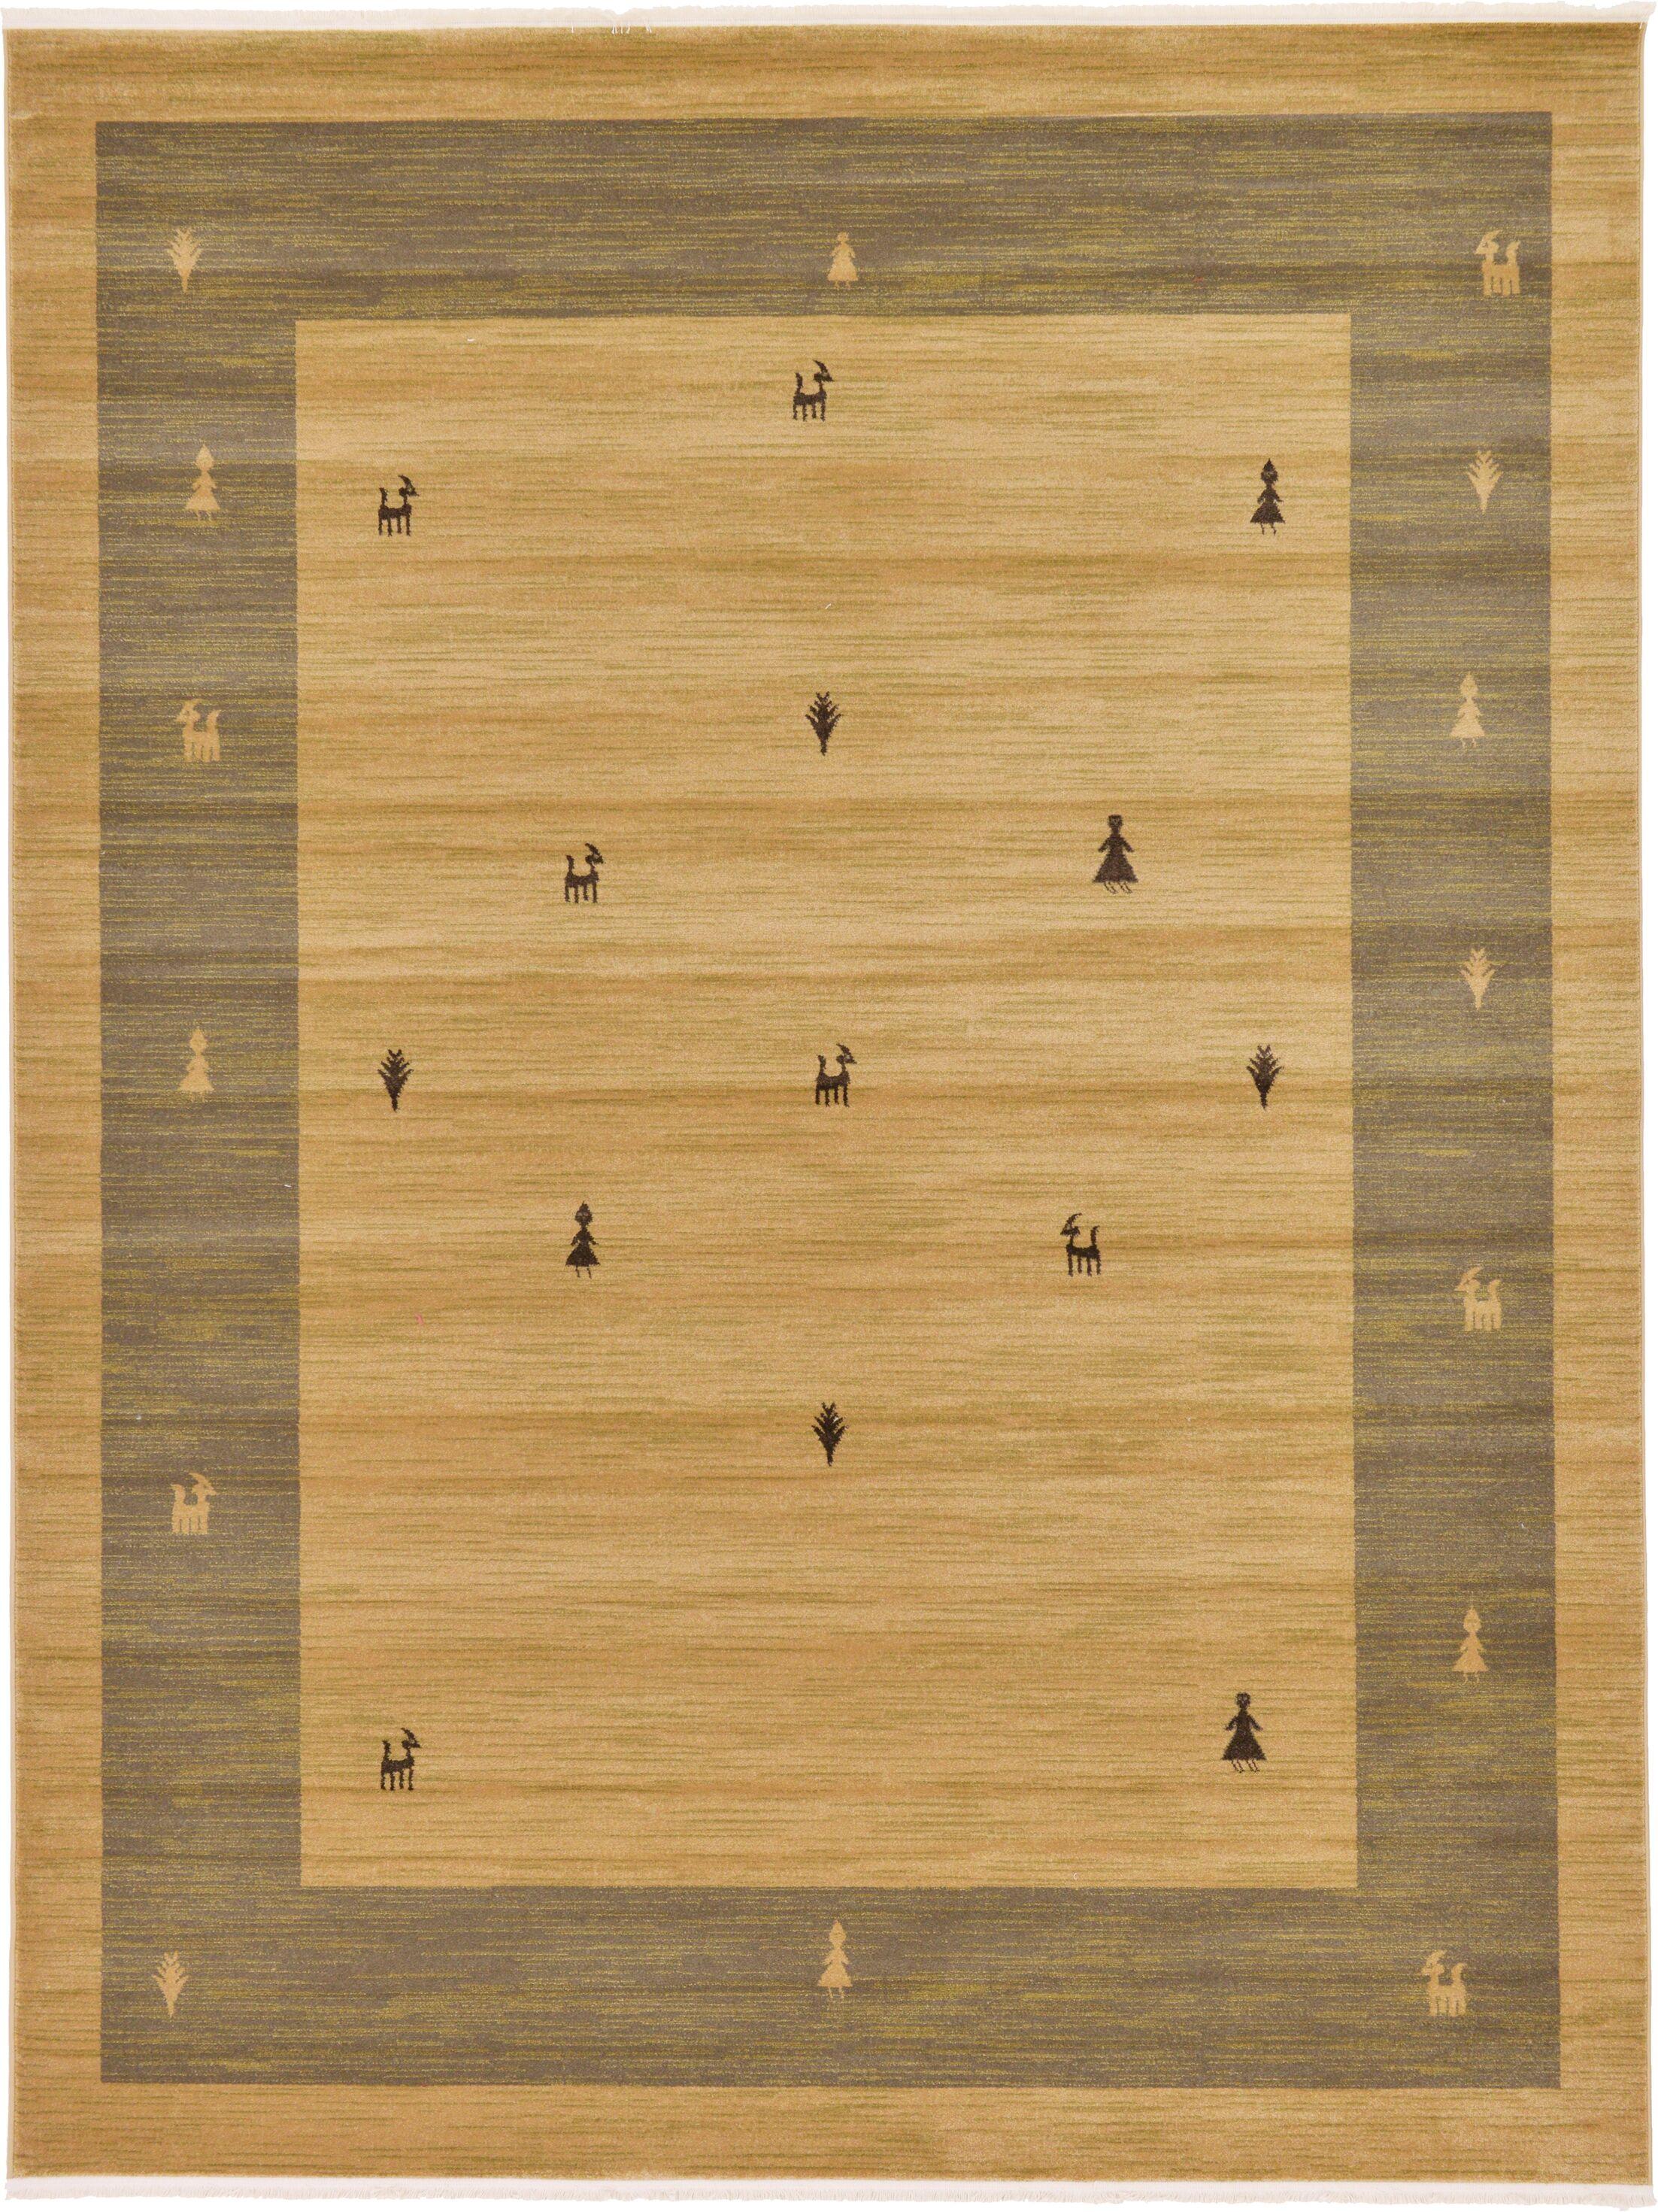 Jan Traditional Tan Area Rug Rug Size: Rectangle 9' x 12'